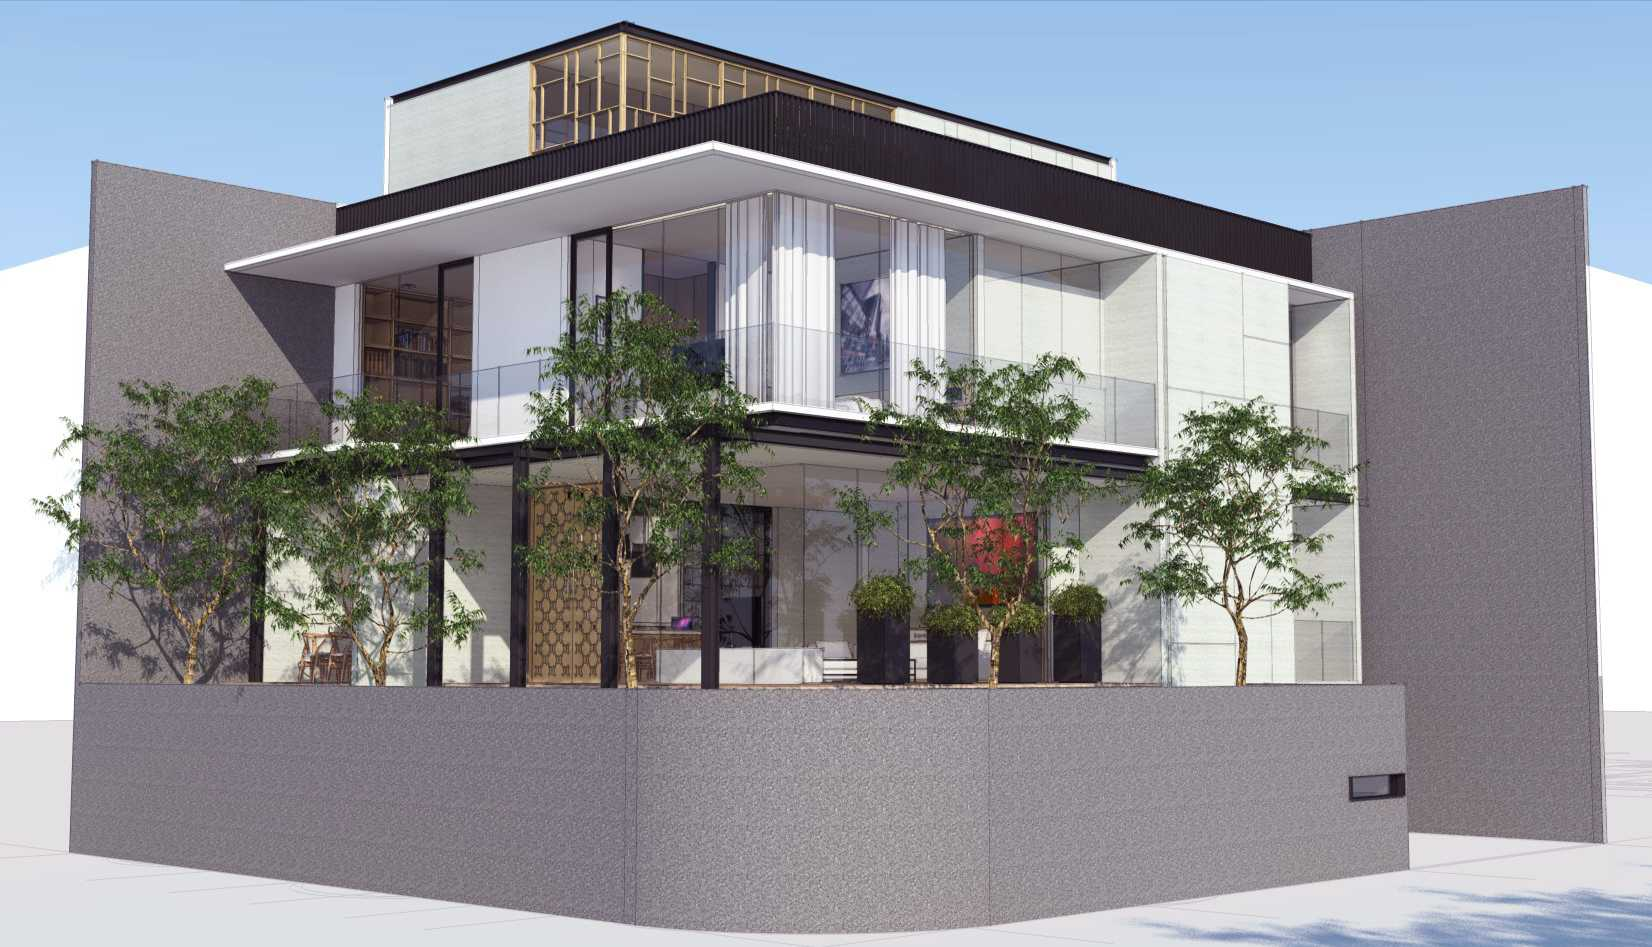 Ari Wibowo Design (Aw.d) Rk House Jakarta, Indonesia - Side View Modern  14527